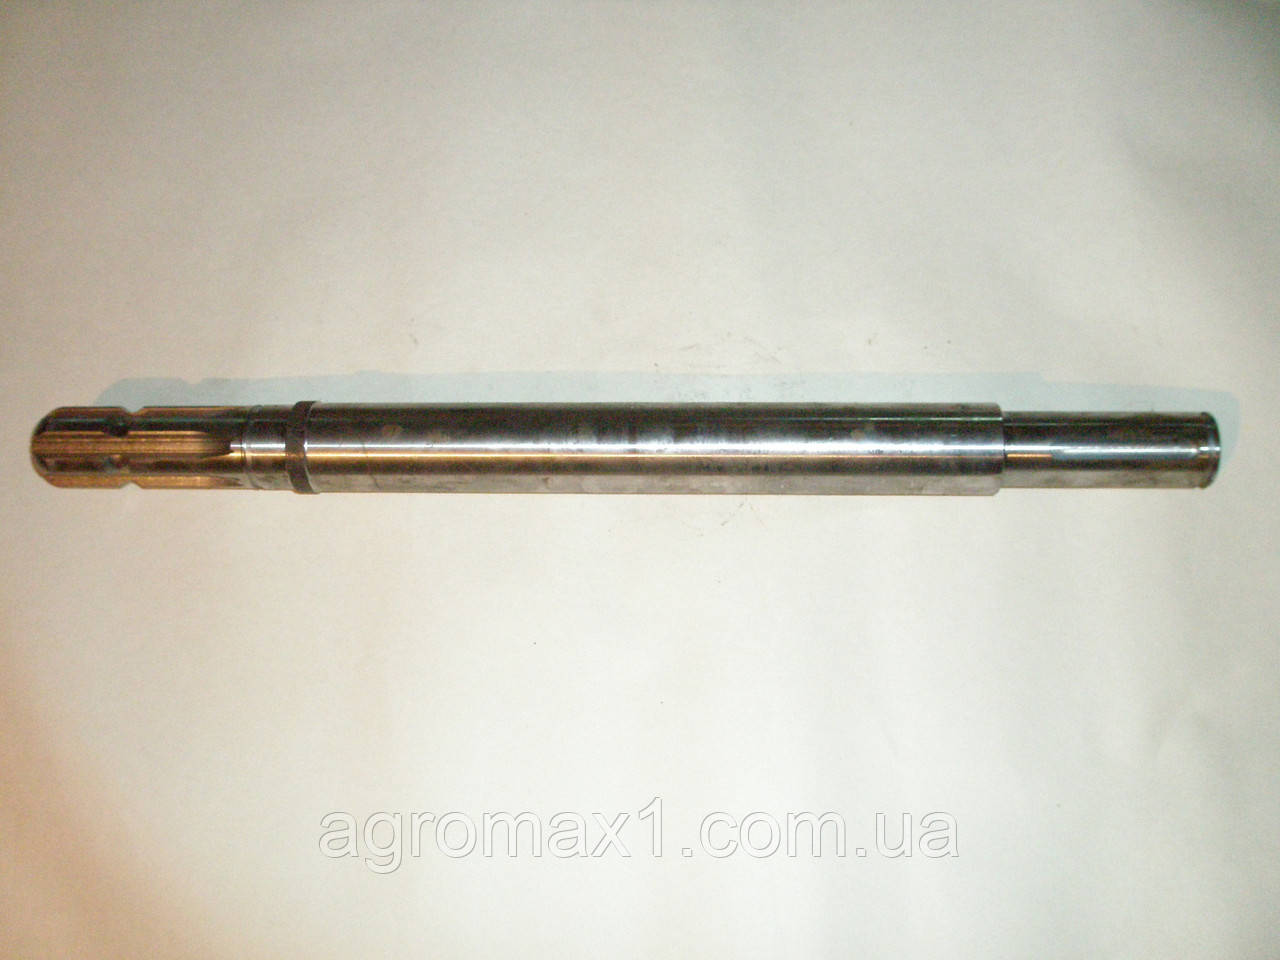 Вал приводной картофелекопалки agromet z609